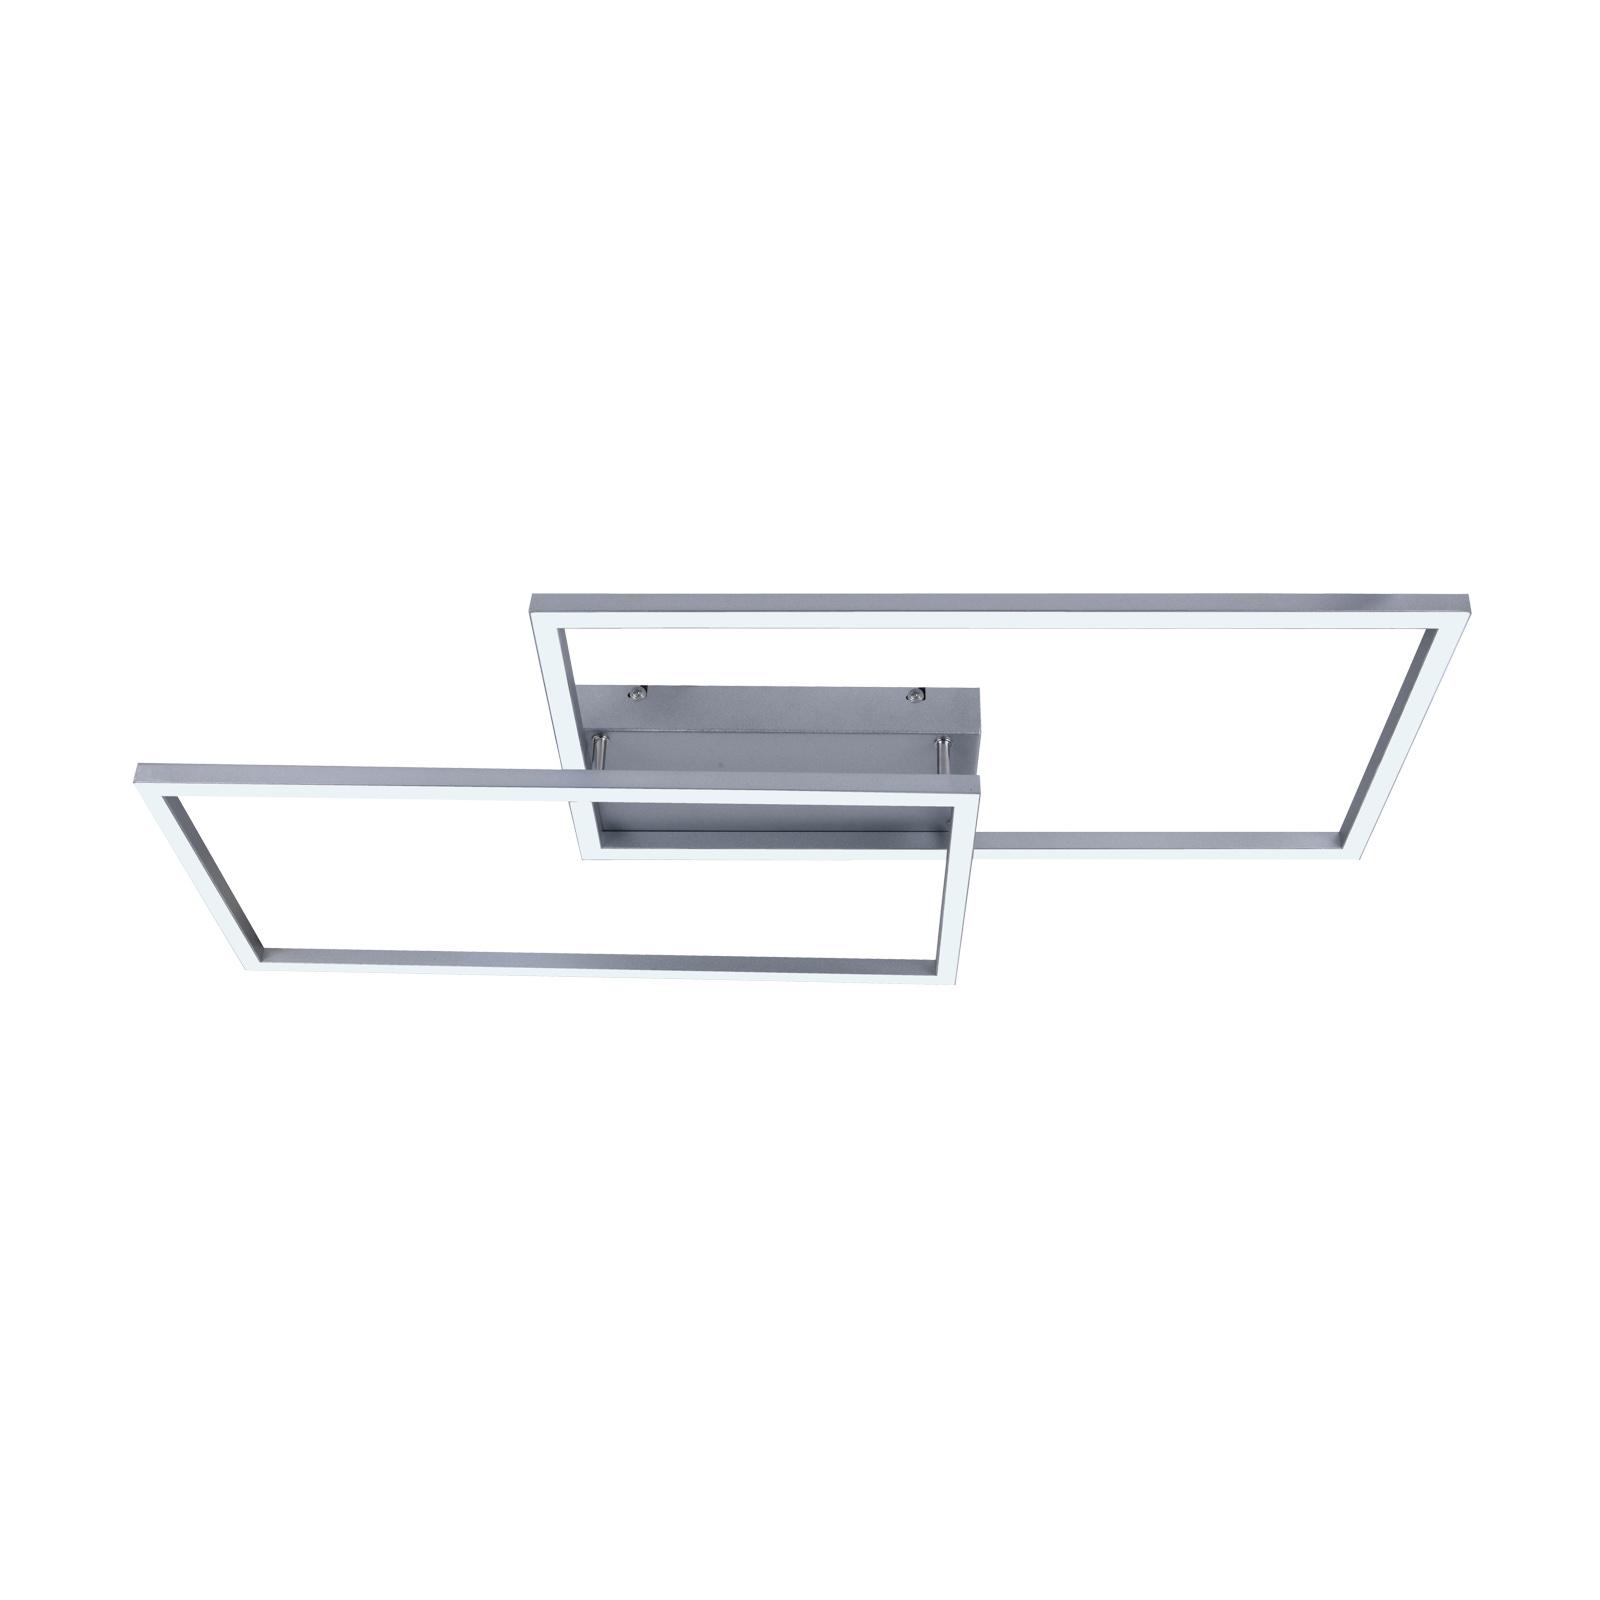 Lucande Muir -LED-kattovalaisin, suorakaide, CCT